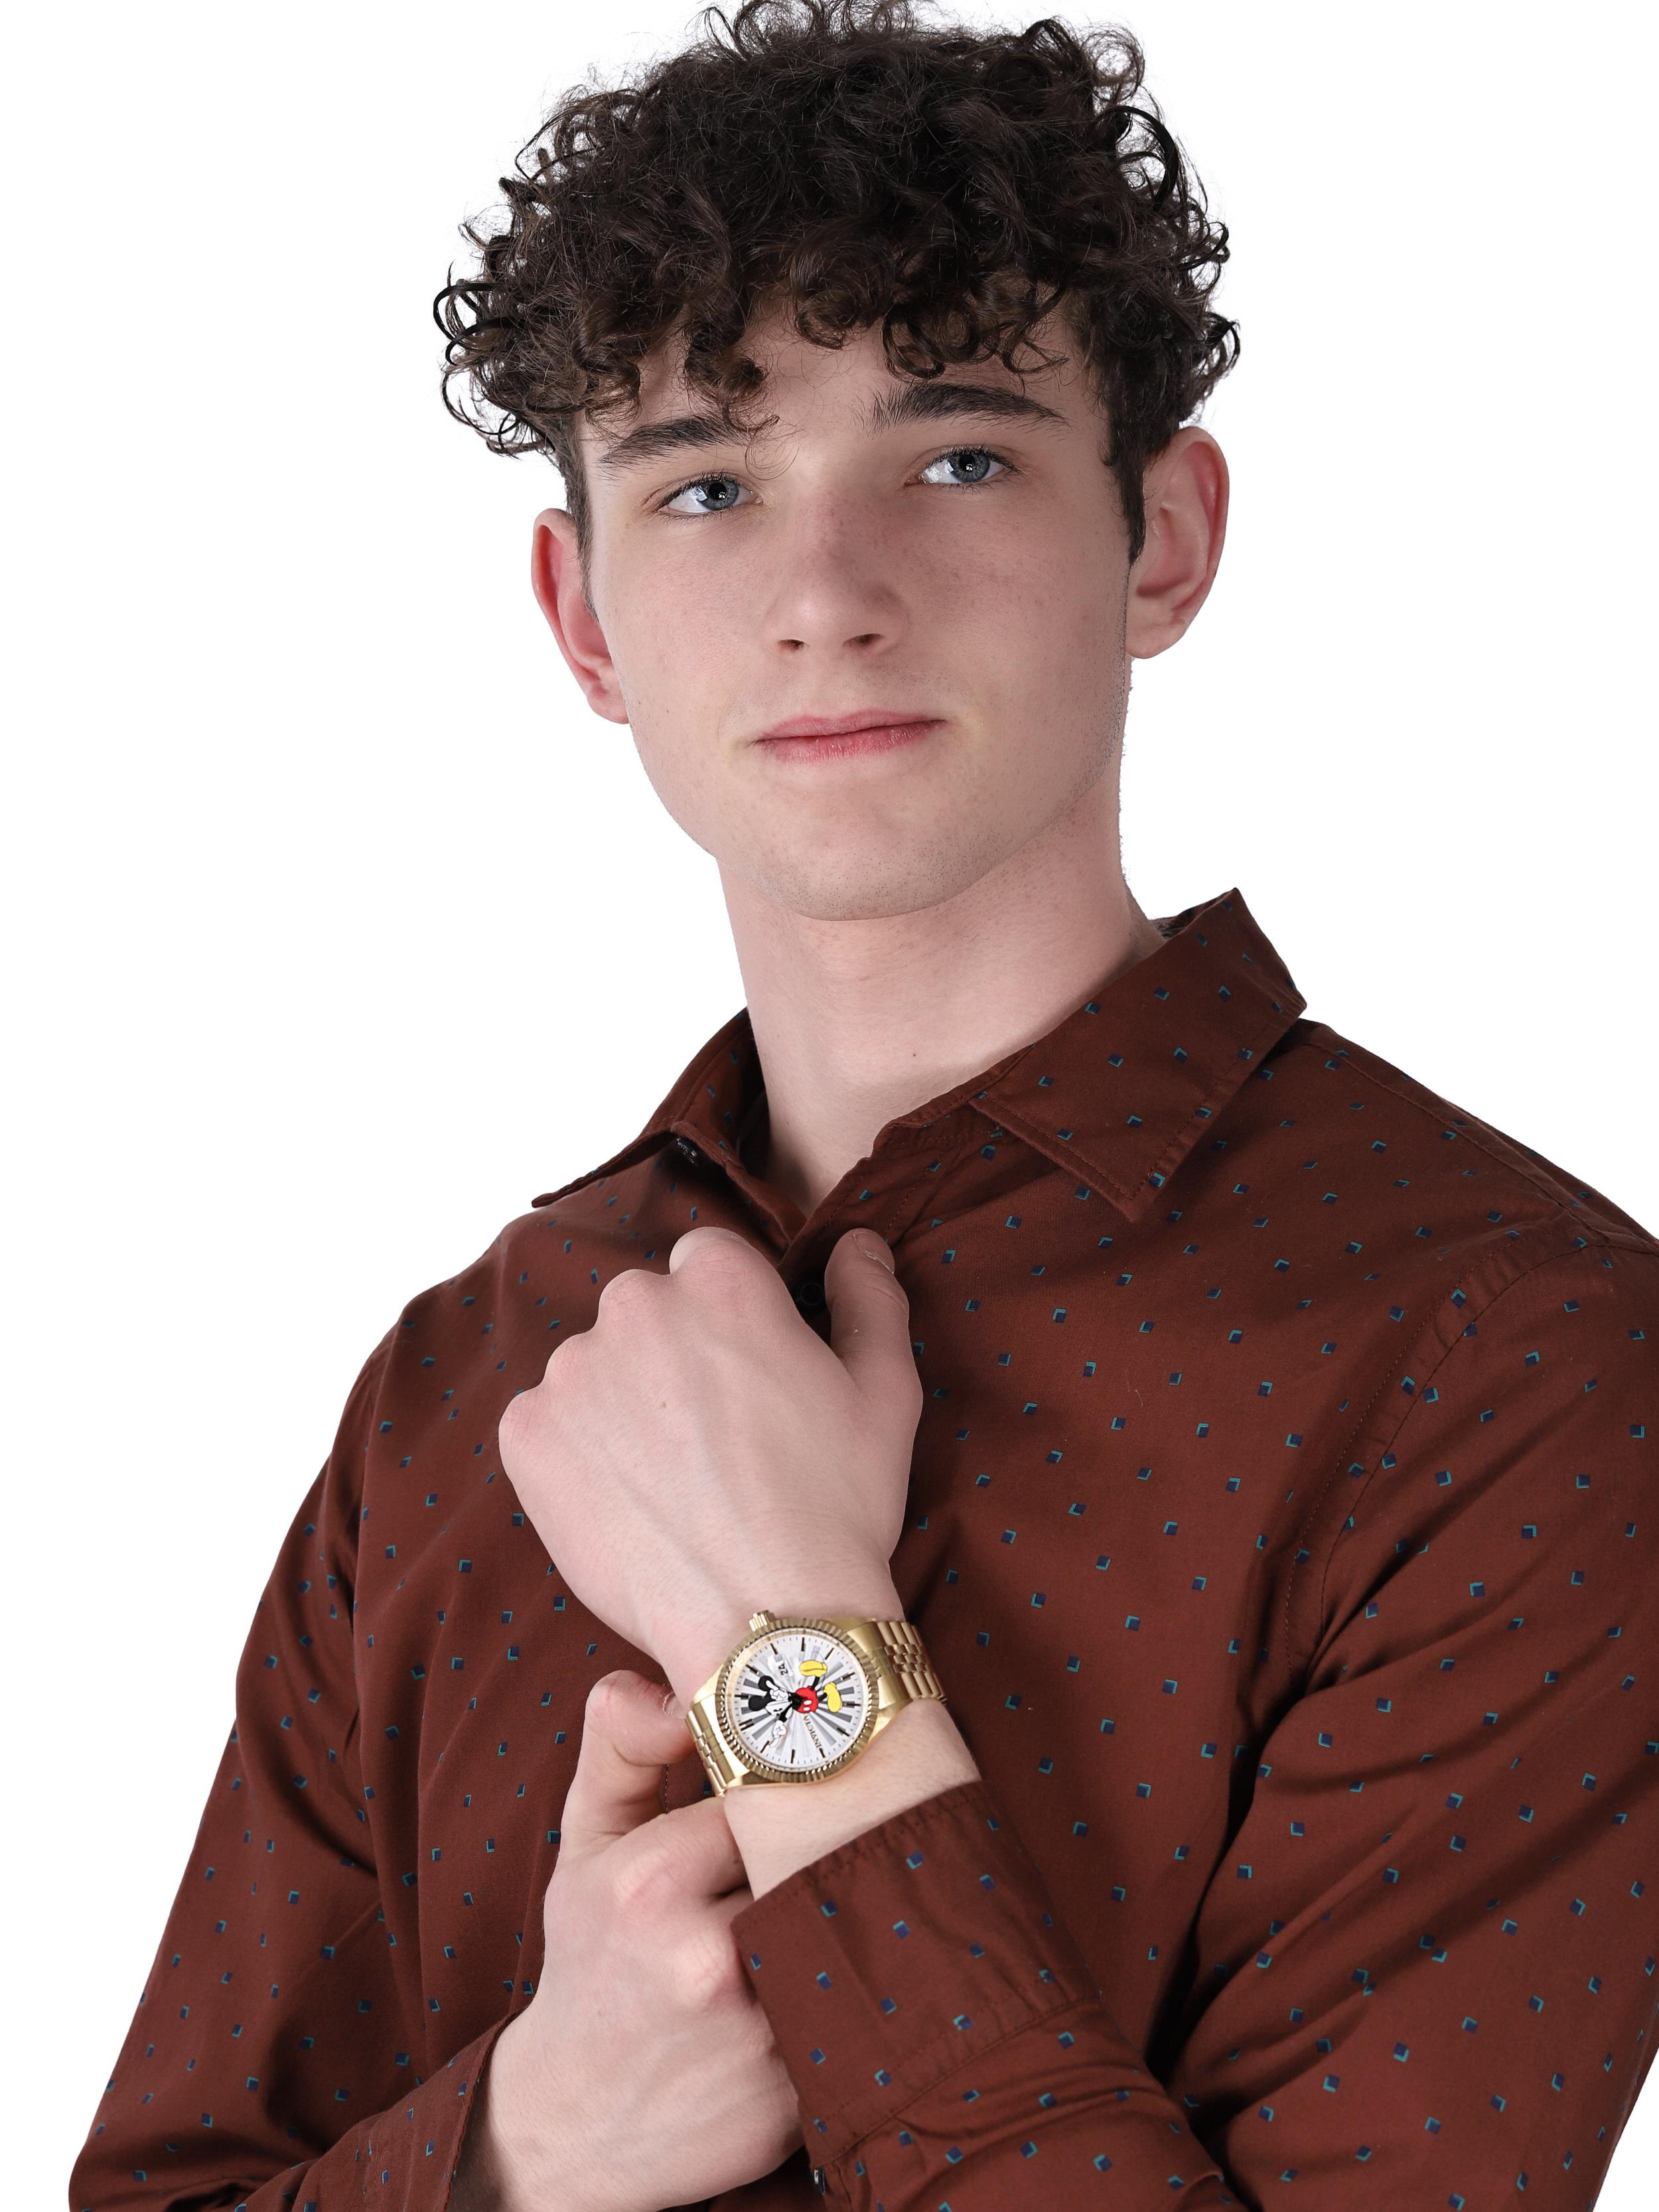 Invicta 22770 DISNEY zegarek klasyczny Disney